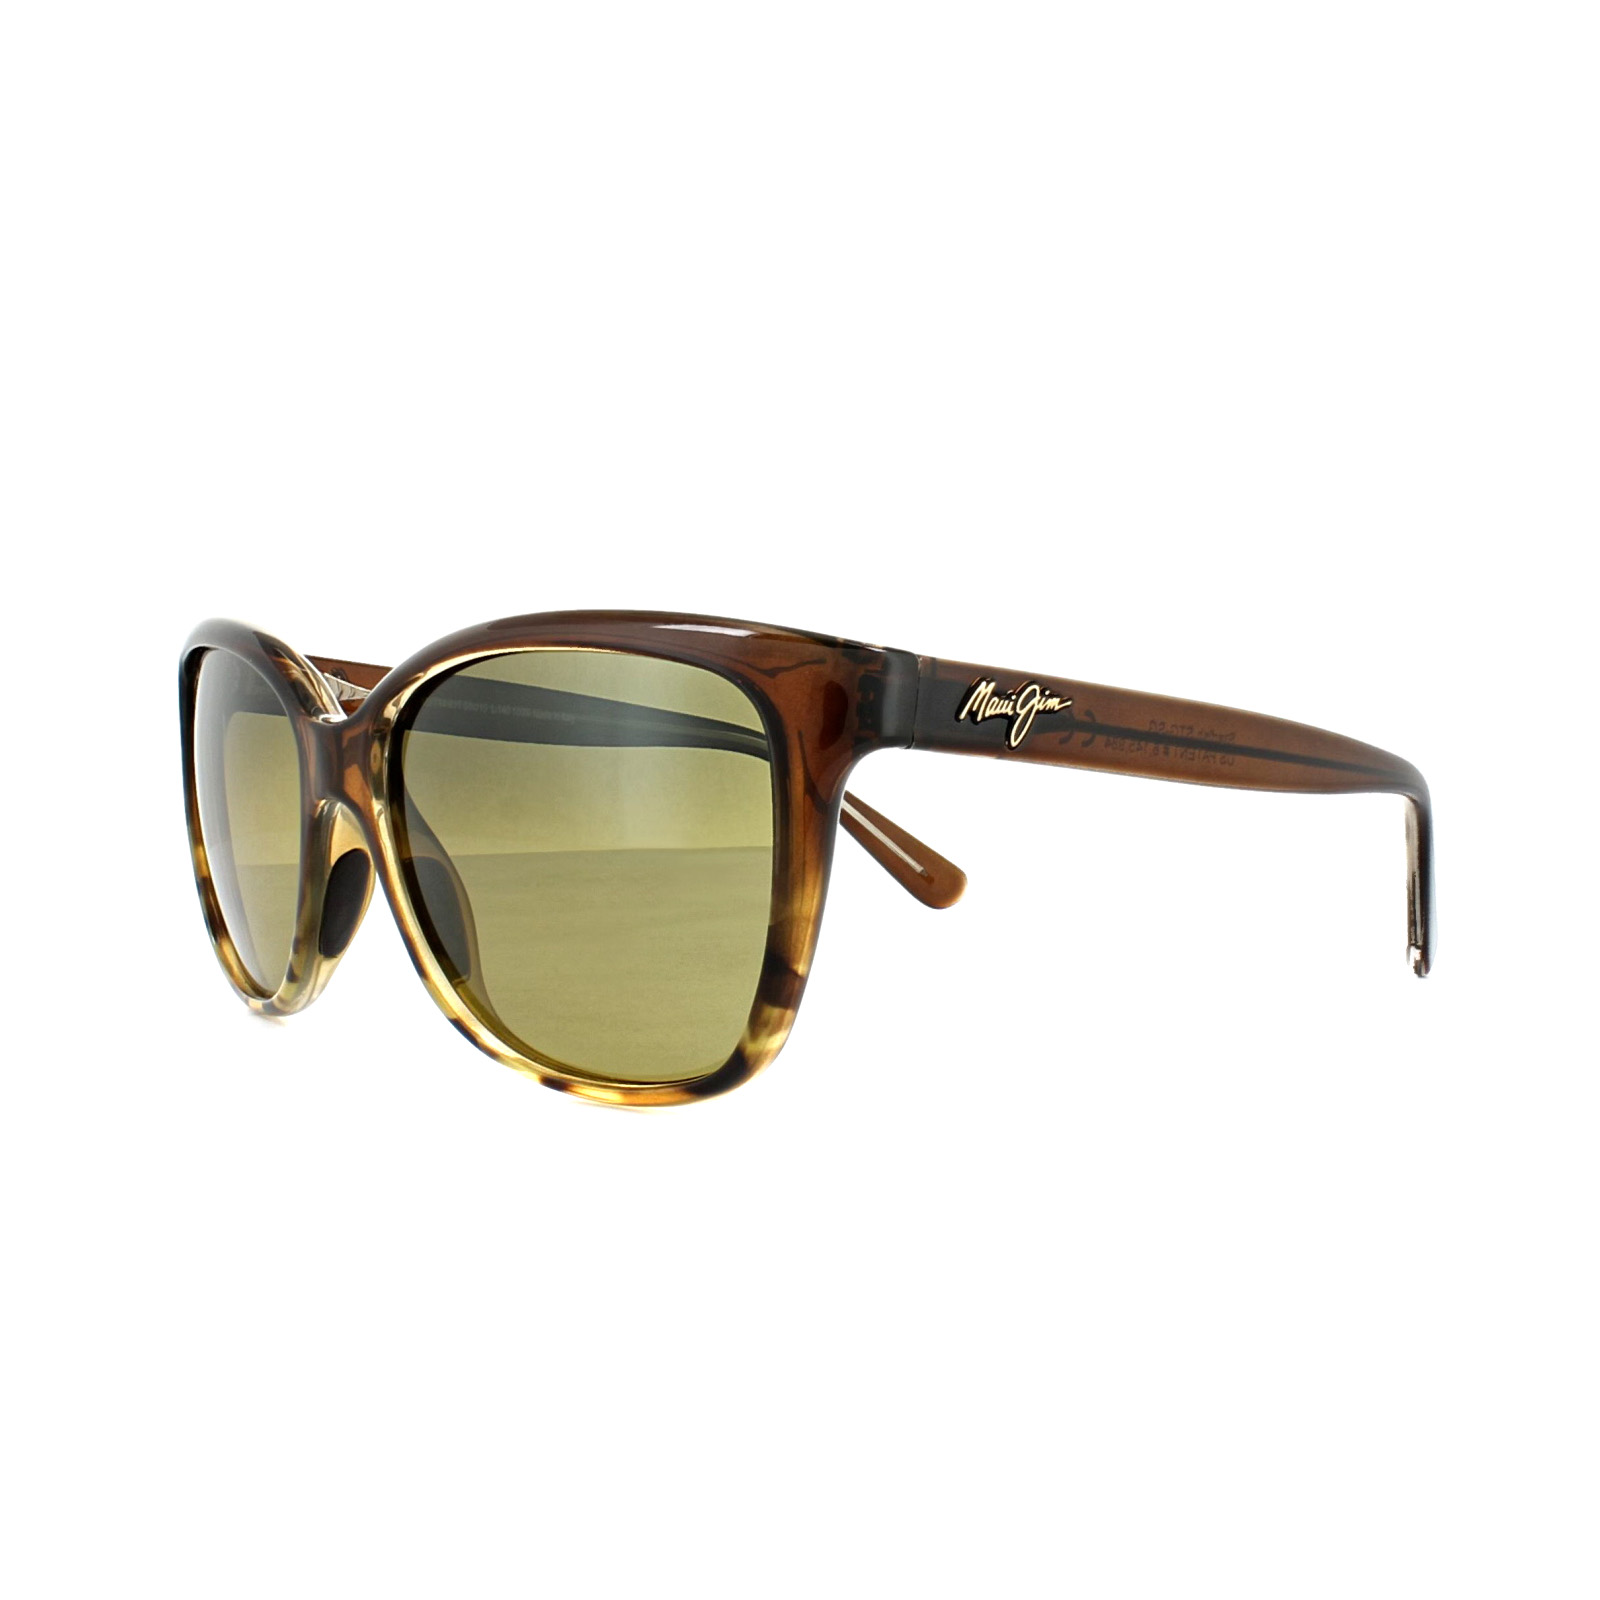 e618e4a7319 Sentinel Maui Jim Sunglasses Starfish HS744-01T Translucent Tortoise with  Chocolate HCL B